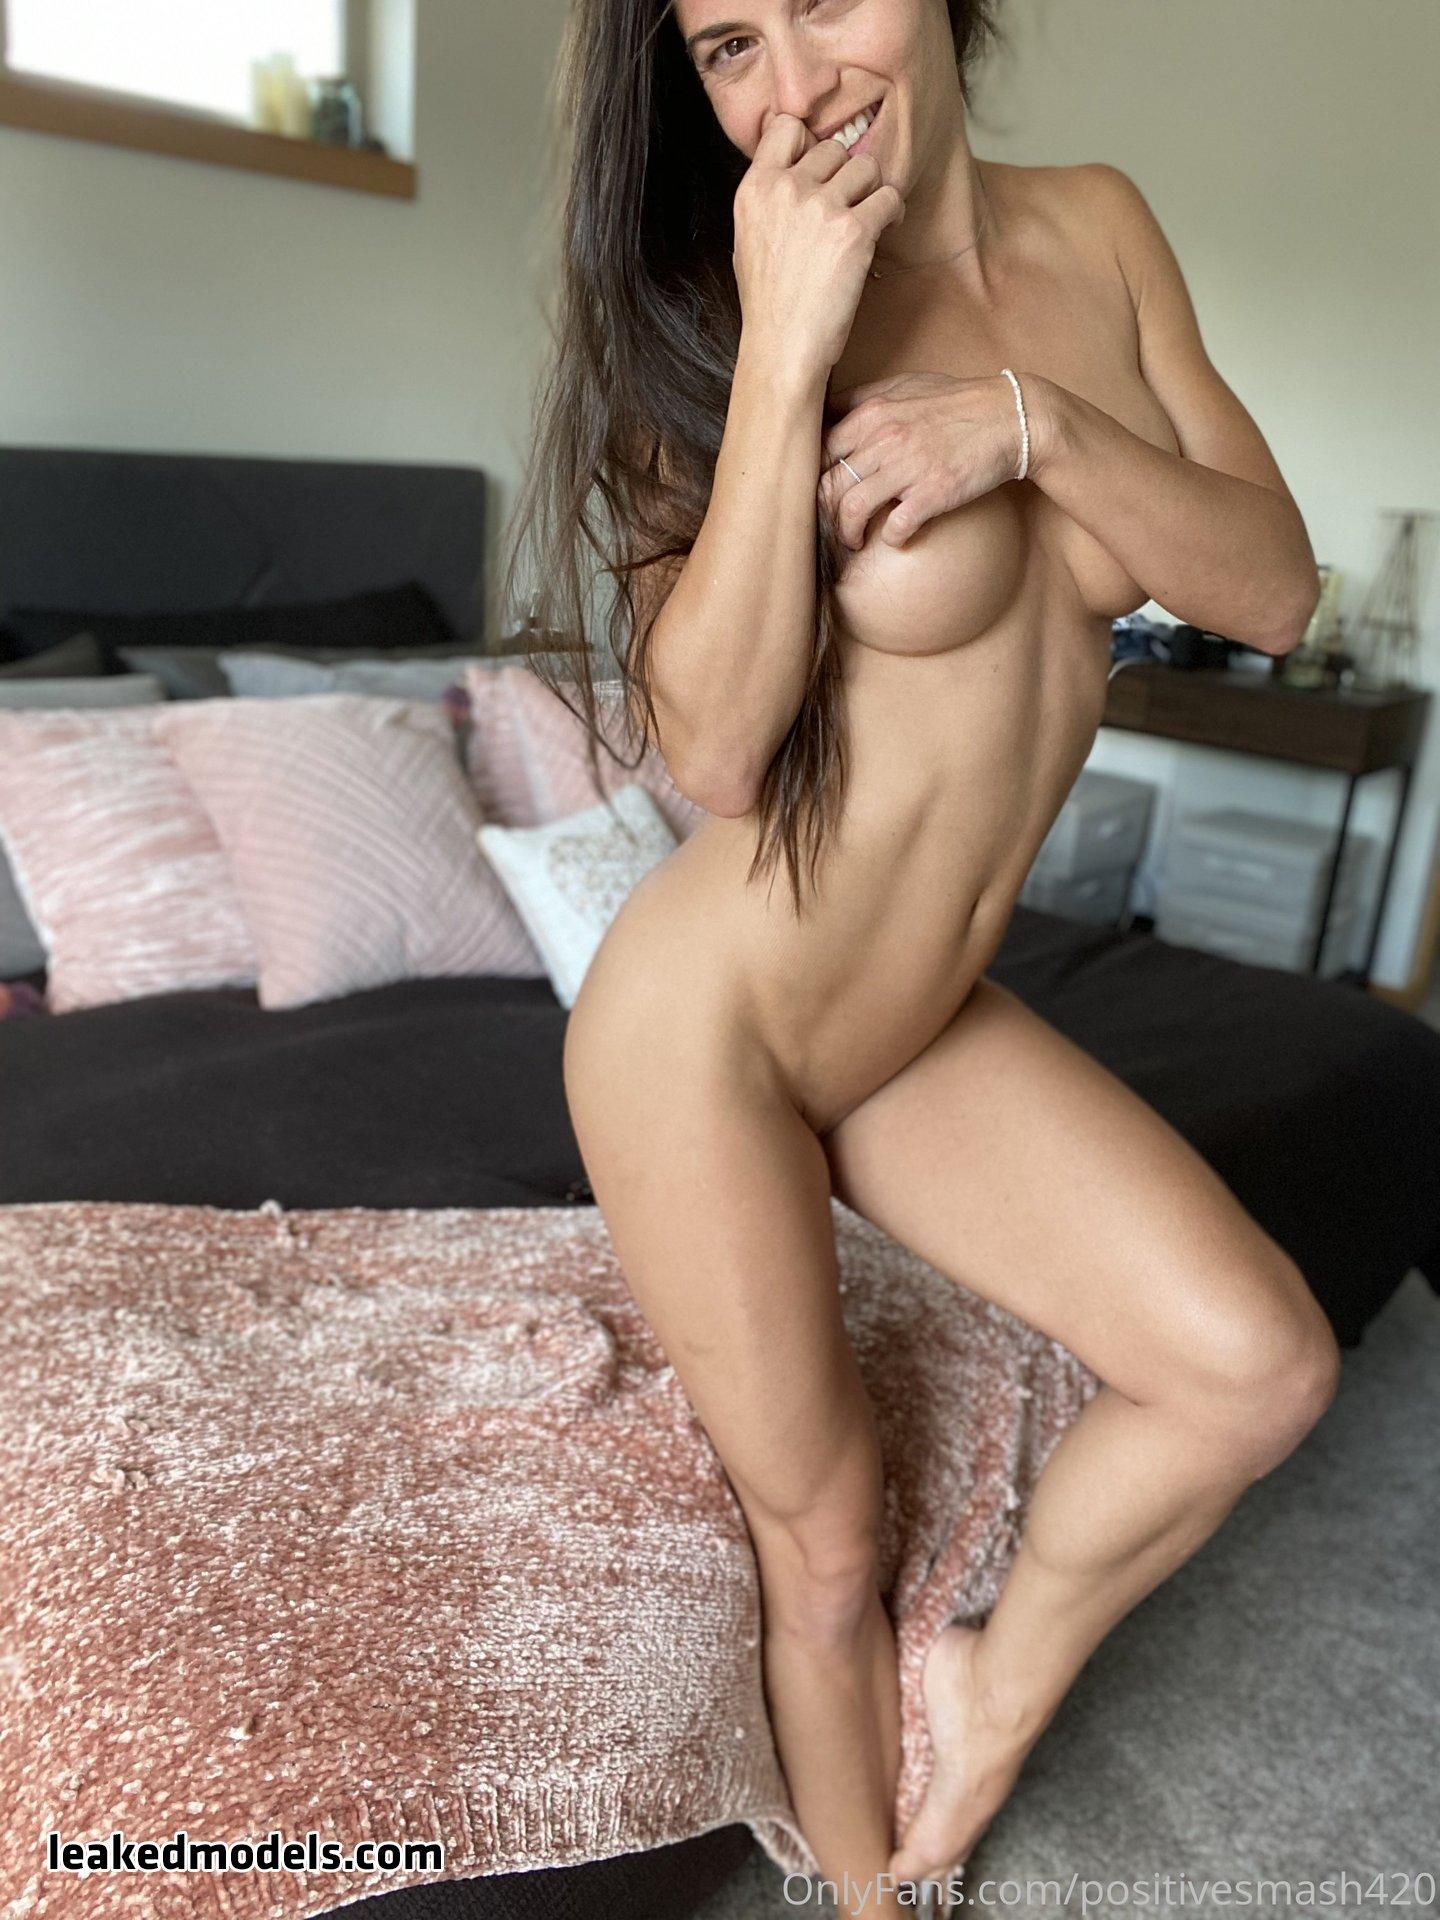 Positive smash Patreon Nude Leaks (37 Photos)